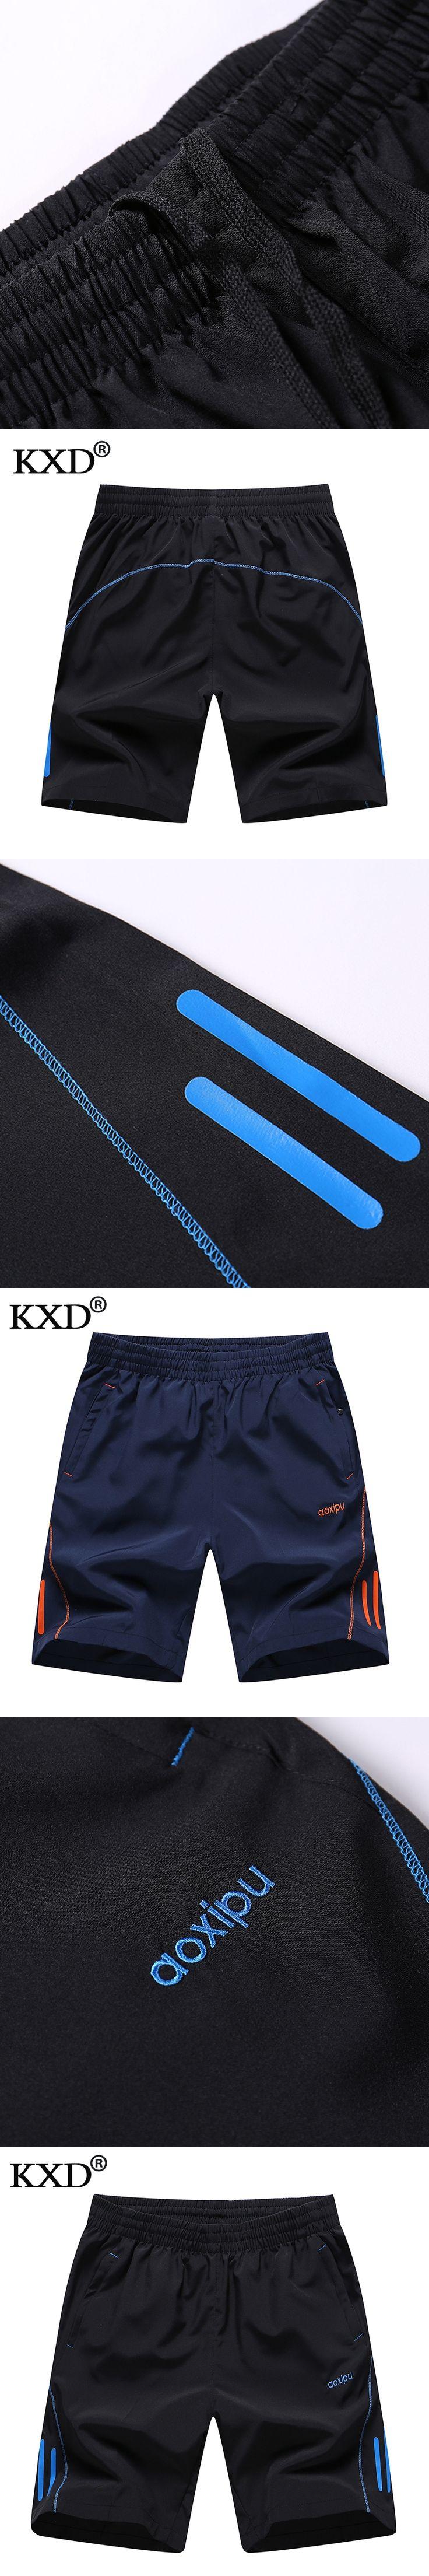 men elastic waist shorts plus big size men summer light casual beach boardshorts gasp casual shorts men Quick dry shorts 5xl 6xl